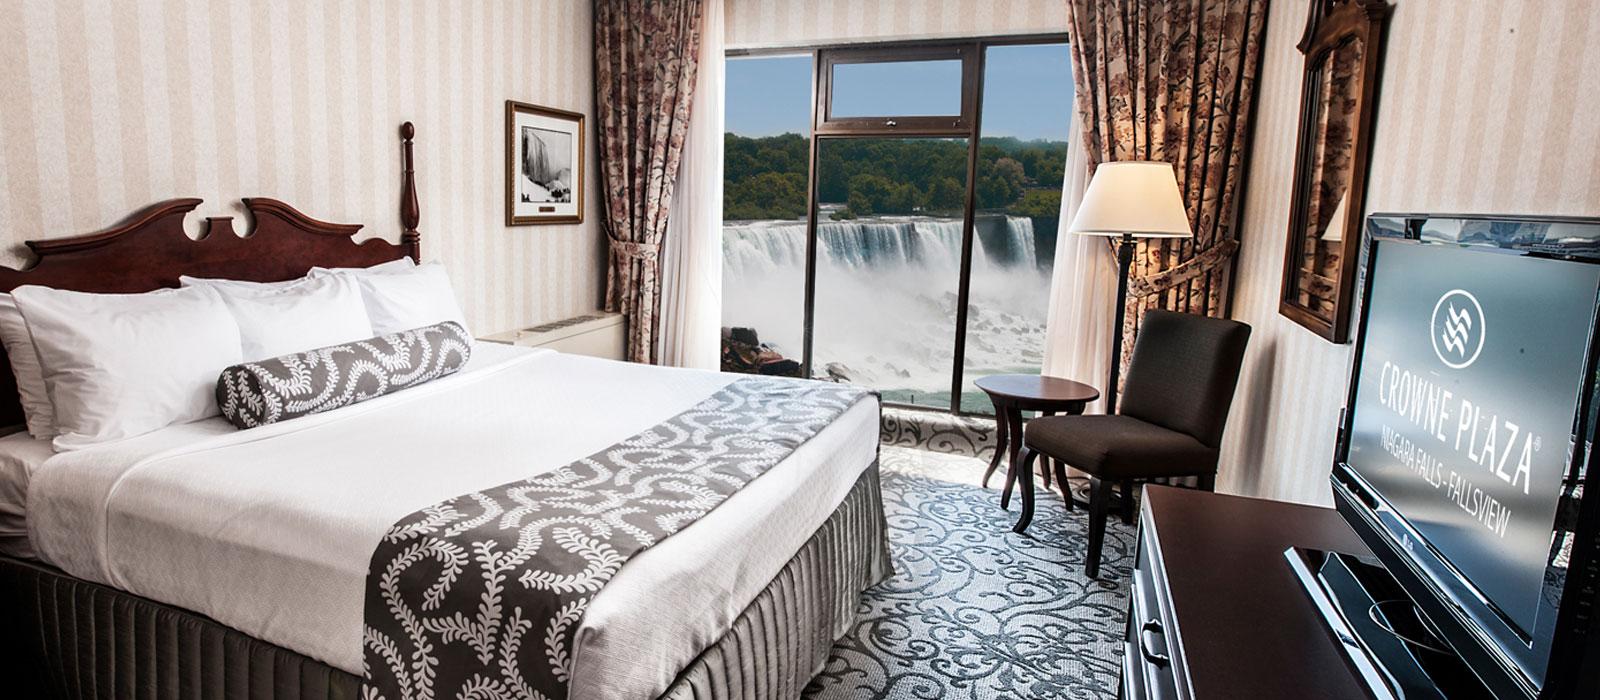 Niagara falls fallsview casino resort 16